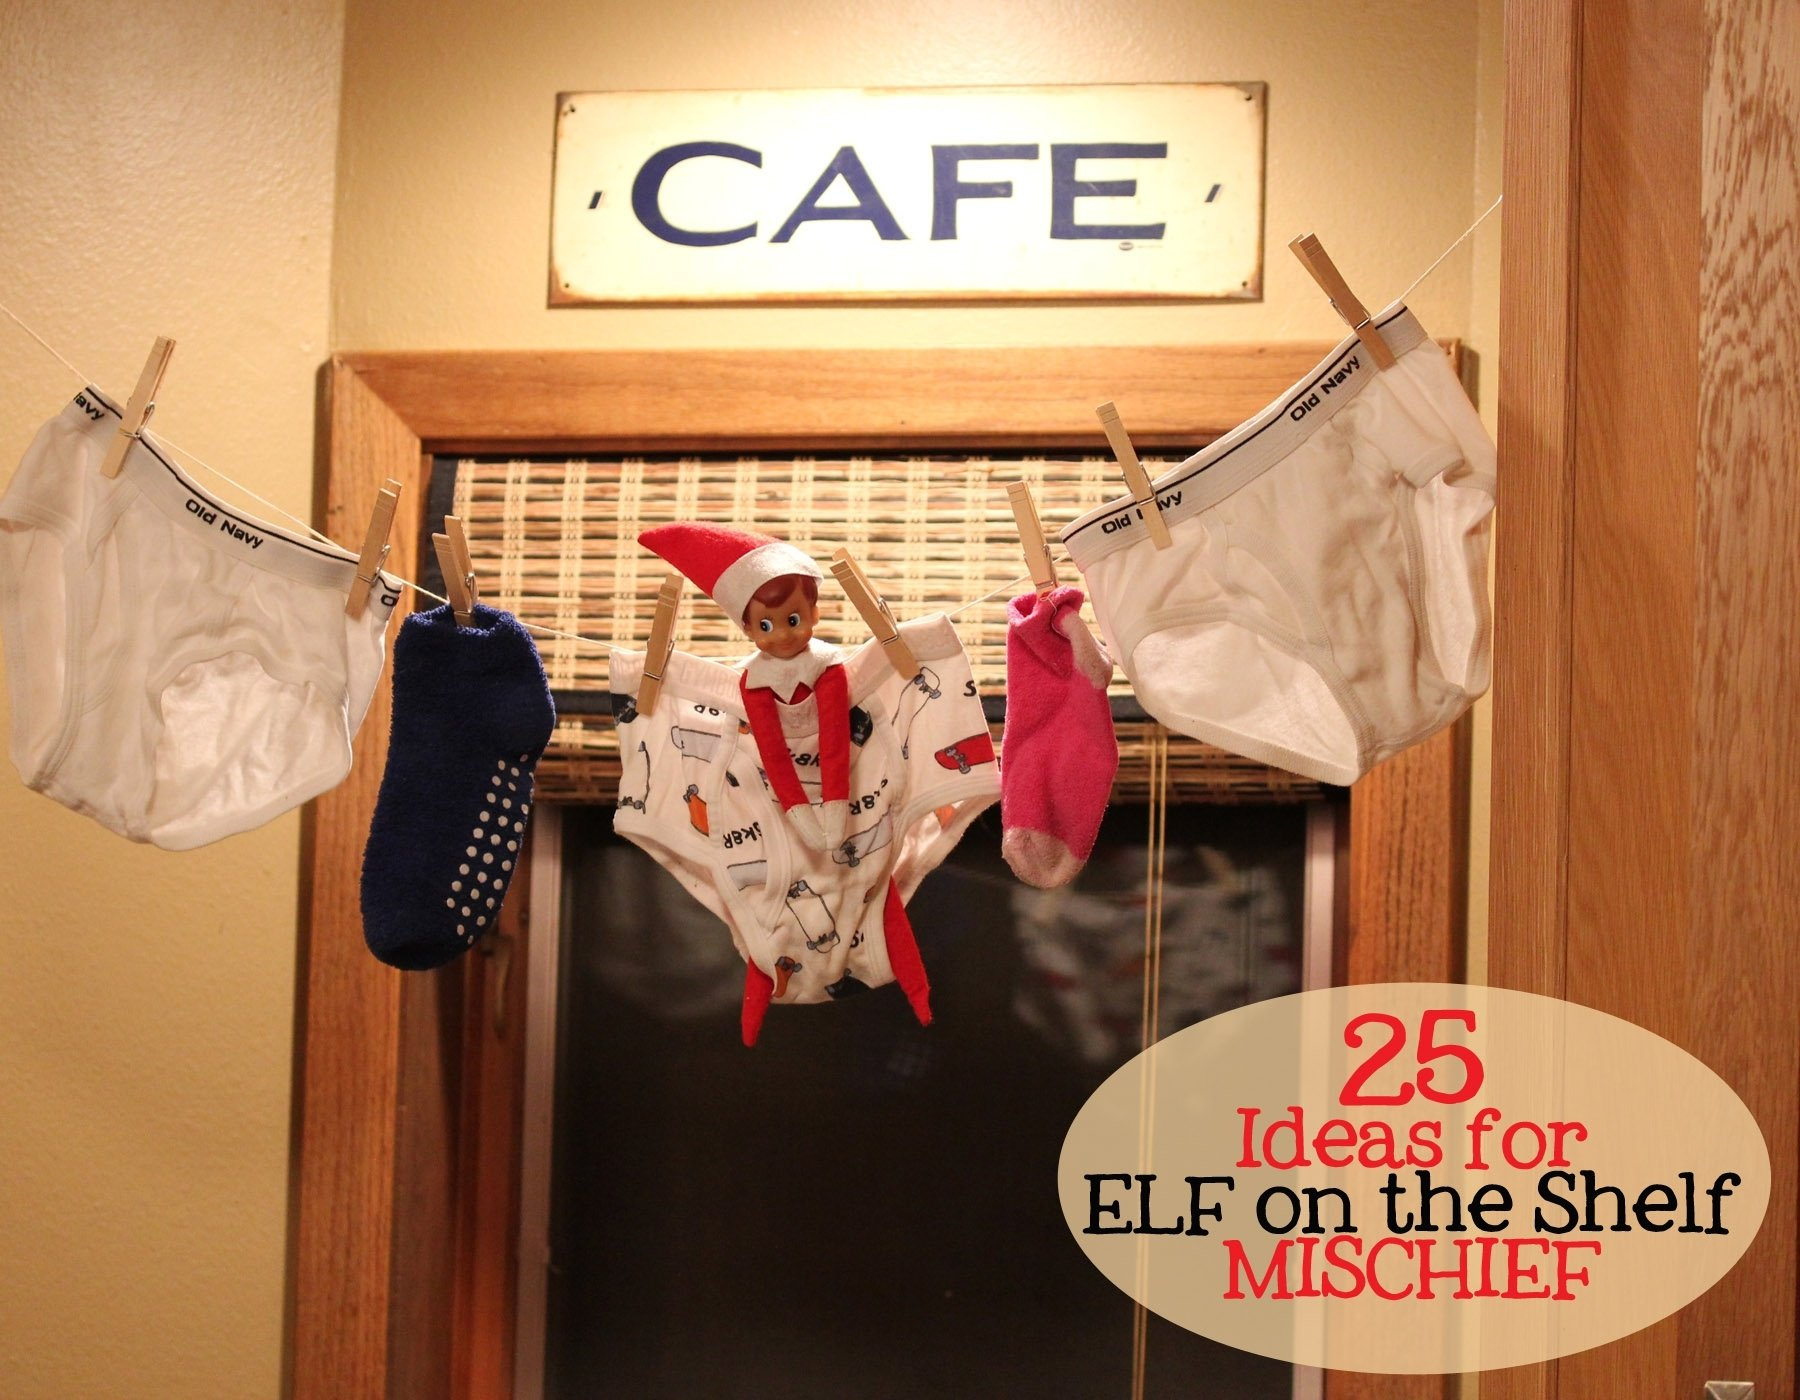 10 Lovely Elf On The Shelf Mischievous Ideas elf on the shelf ideas getting into mischief mommysavers 1 2020